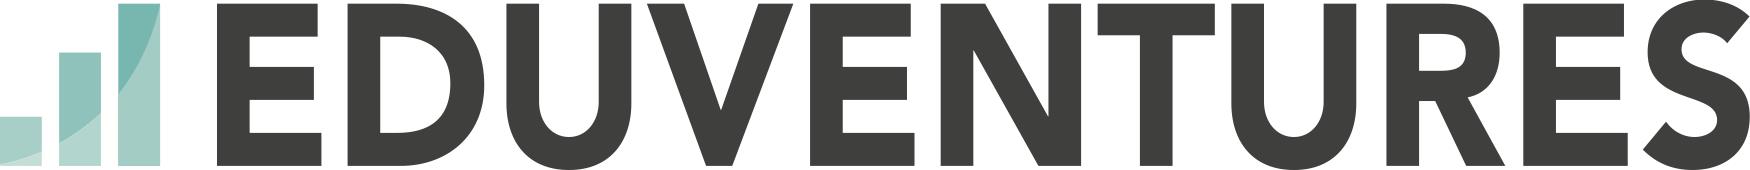 Eduventures_Logo_No_Tagline_Long.png